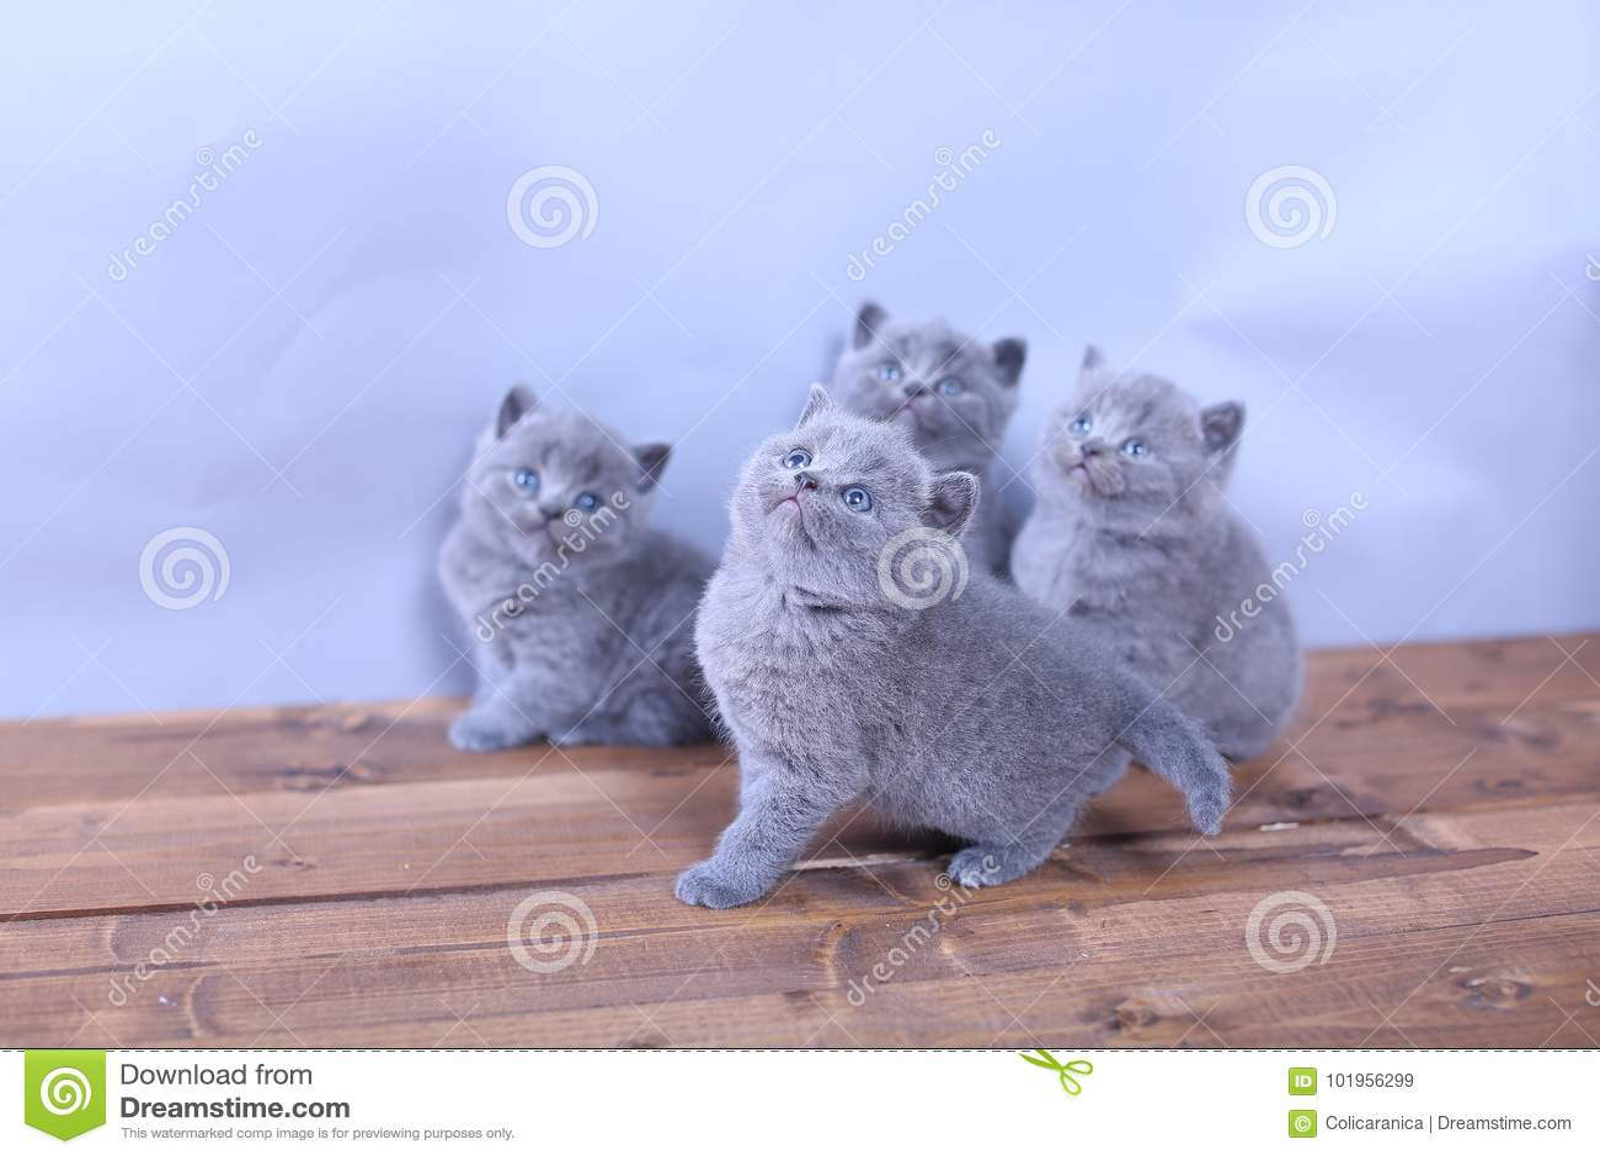 Cute Kittens Looking Up British Shorthair Stock Image Image Of Beige Amazing 101956299